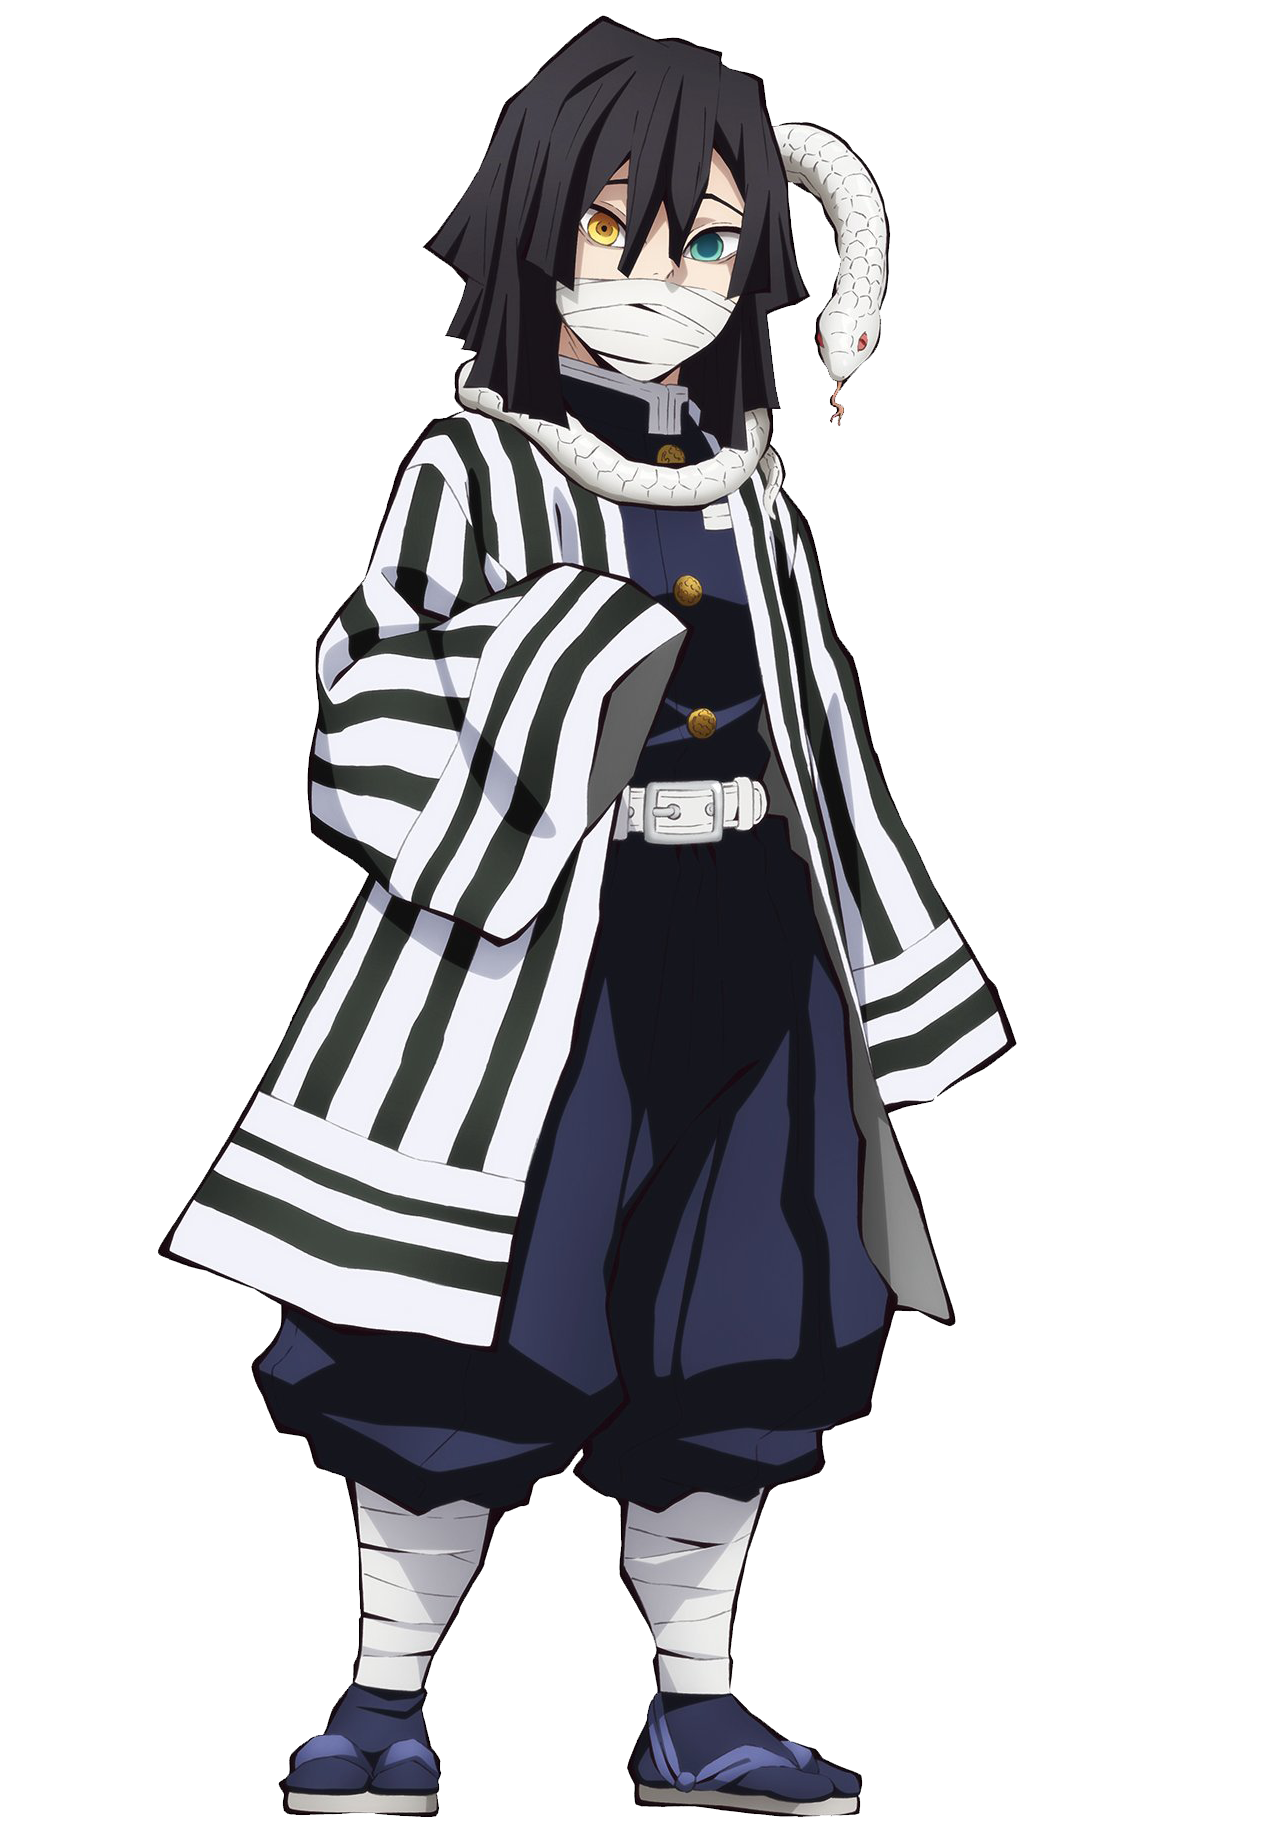 Obanai Iguro Kimetsu No Yaiba Wiki Fandom He is also a demon slayer, and the sound hashira (音 (おと) 柱 (ばしら) oto bashira?) of the demon slayer corps. obanai iguro kimetsu no yaiba wiki